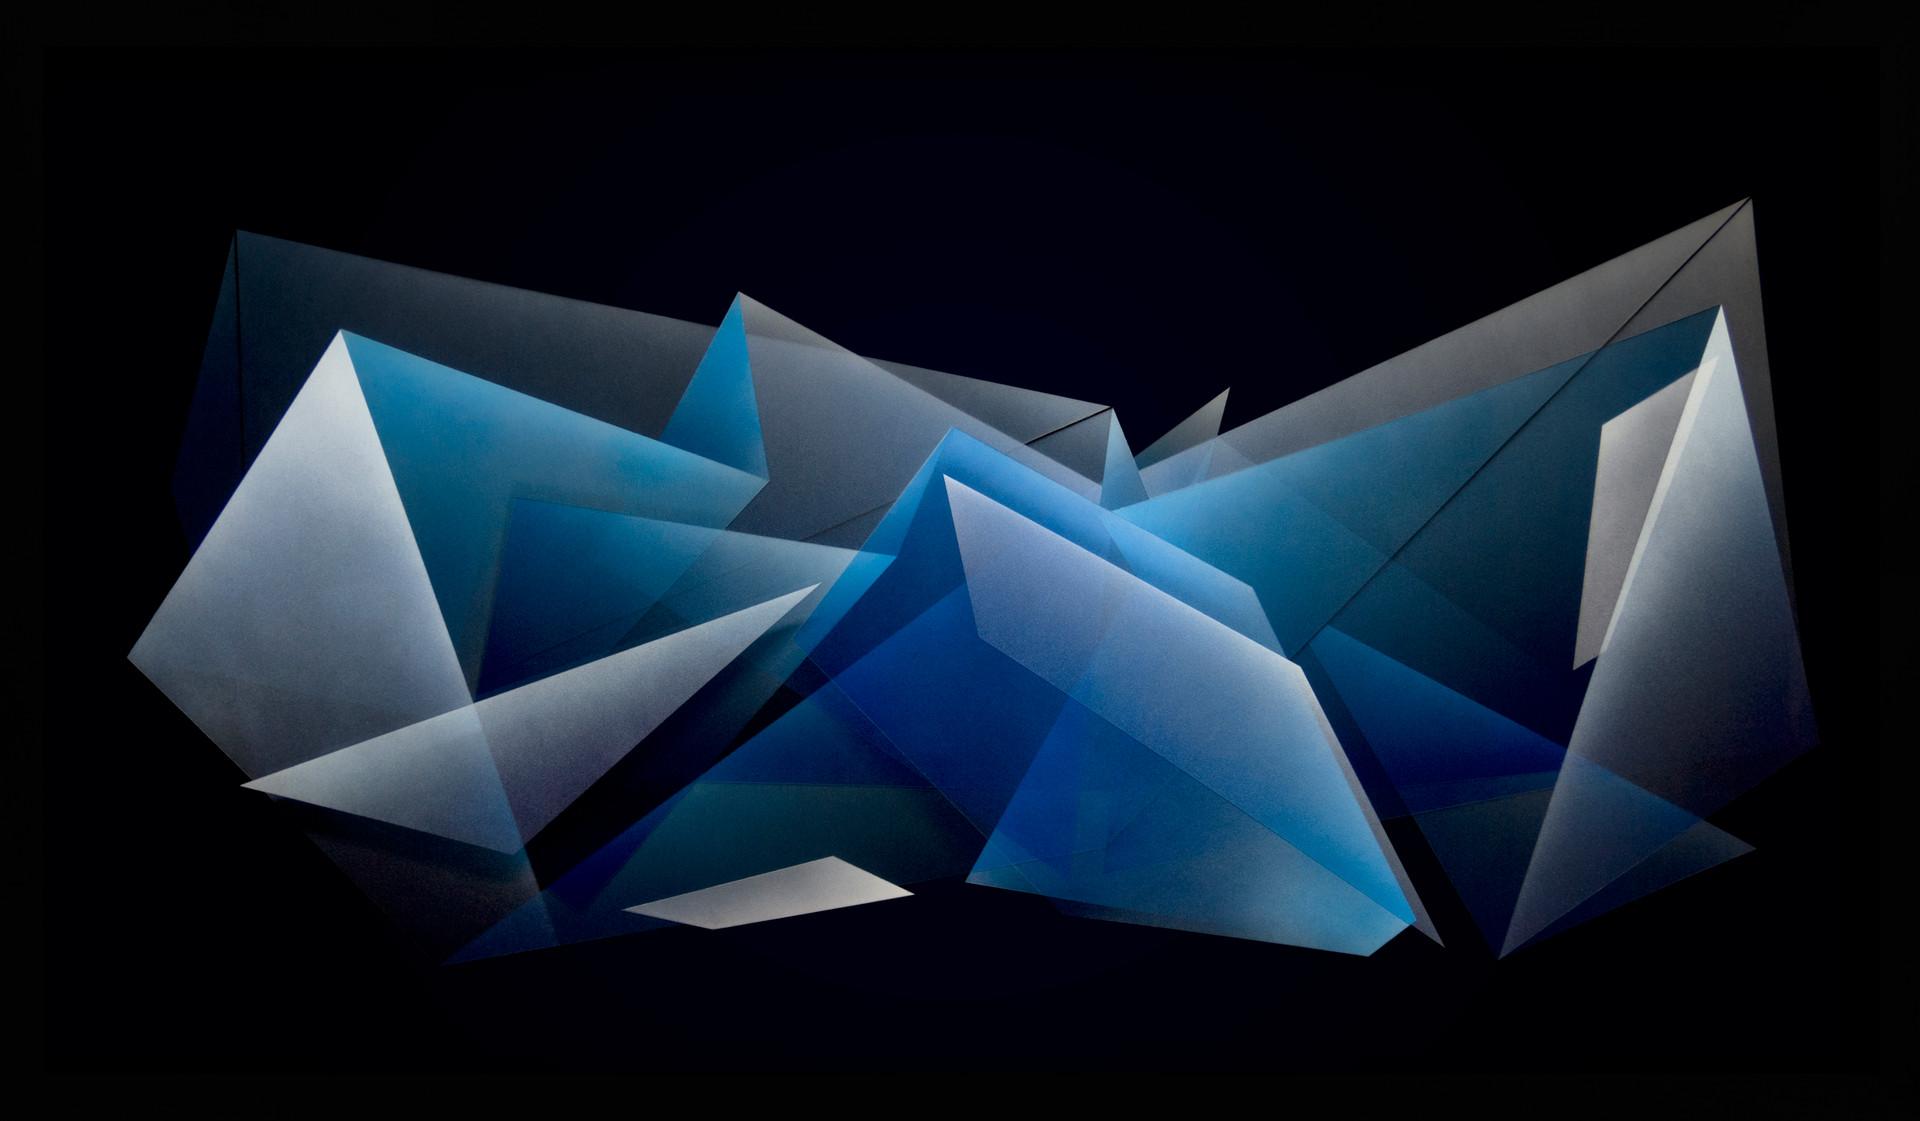 Zac Koukoravas-Black and Blue-2017-acrylic and enamel paint on acrylic-84x144cm.